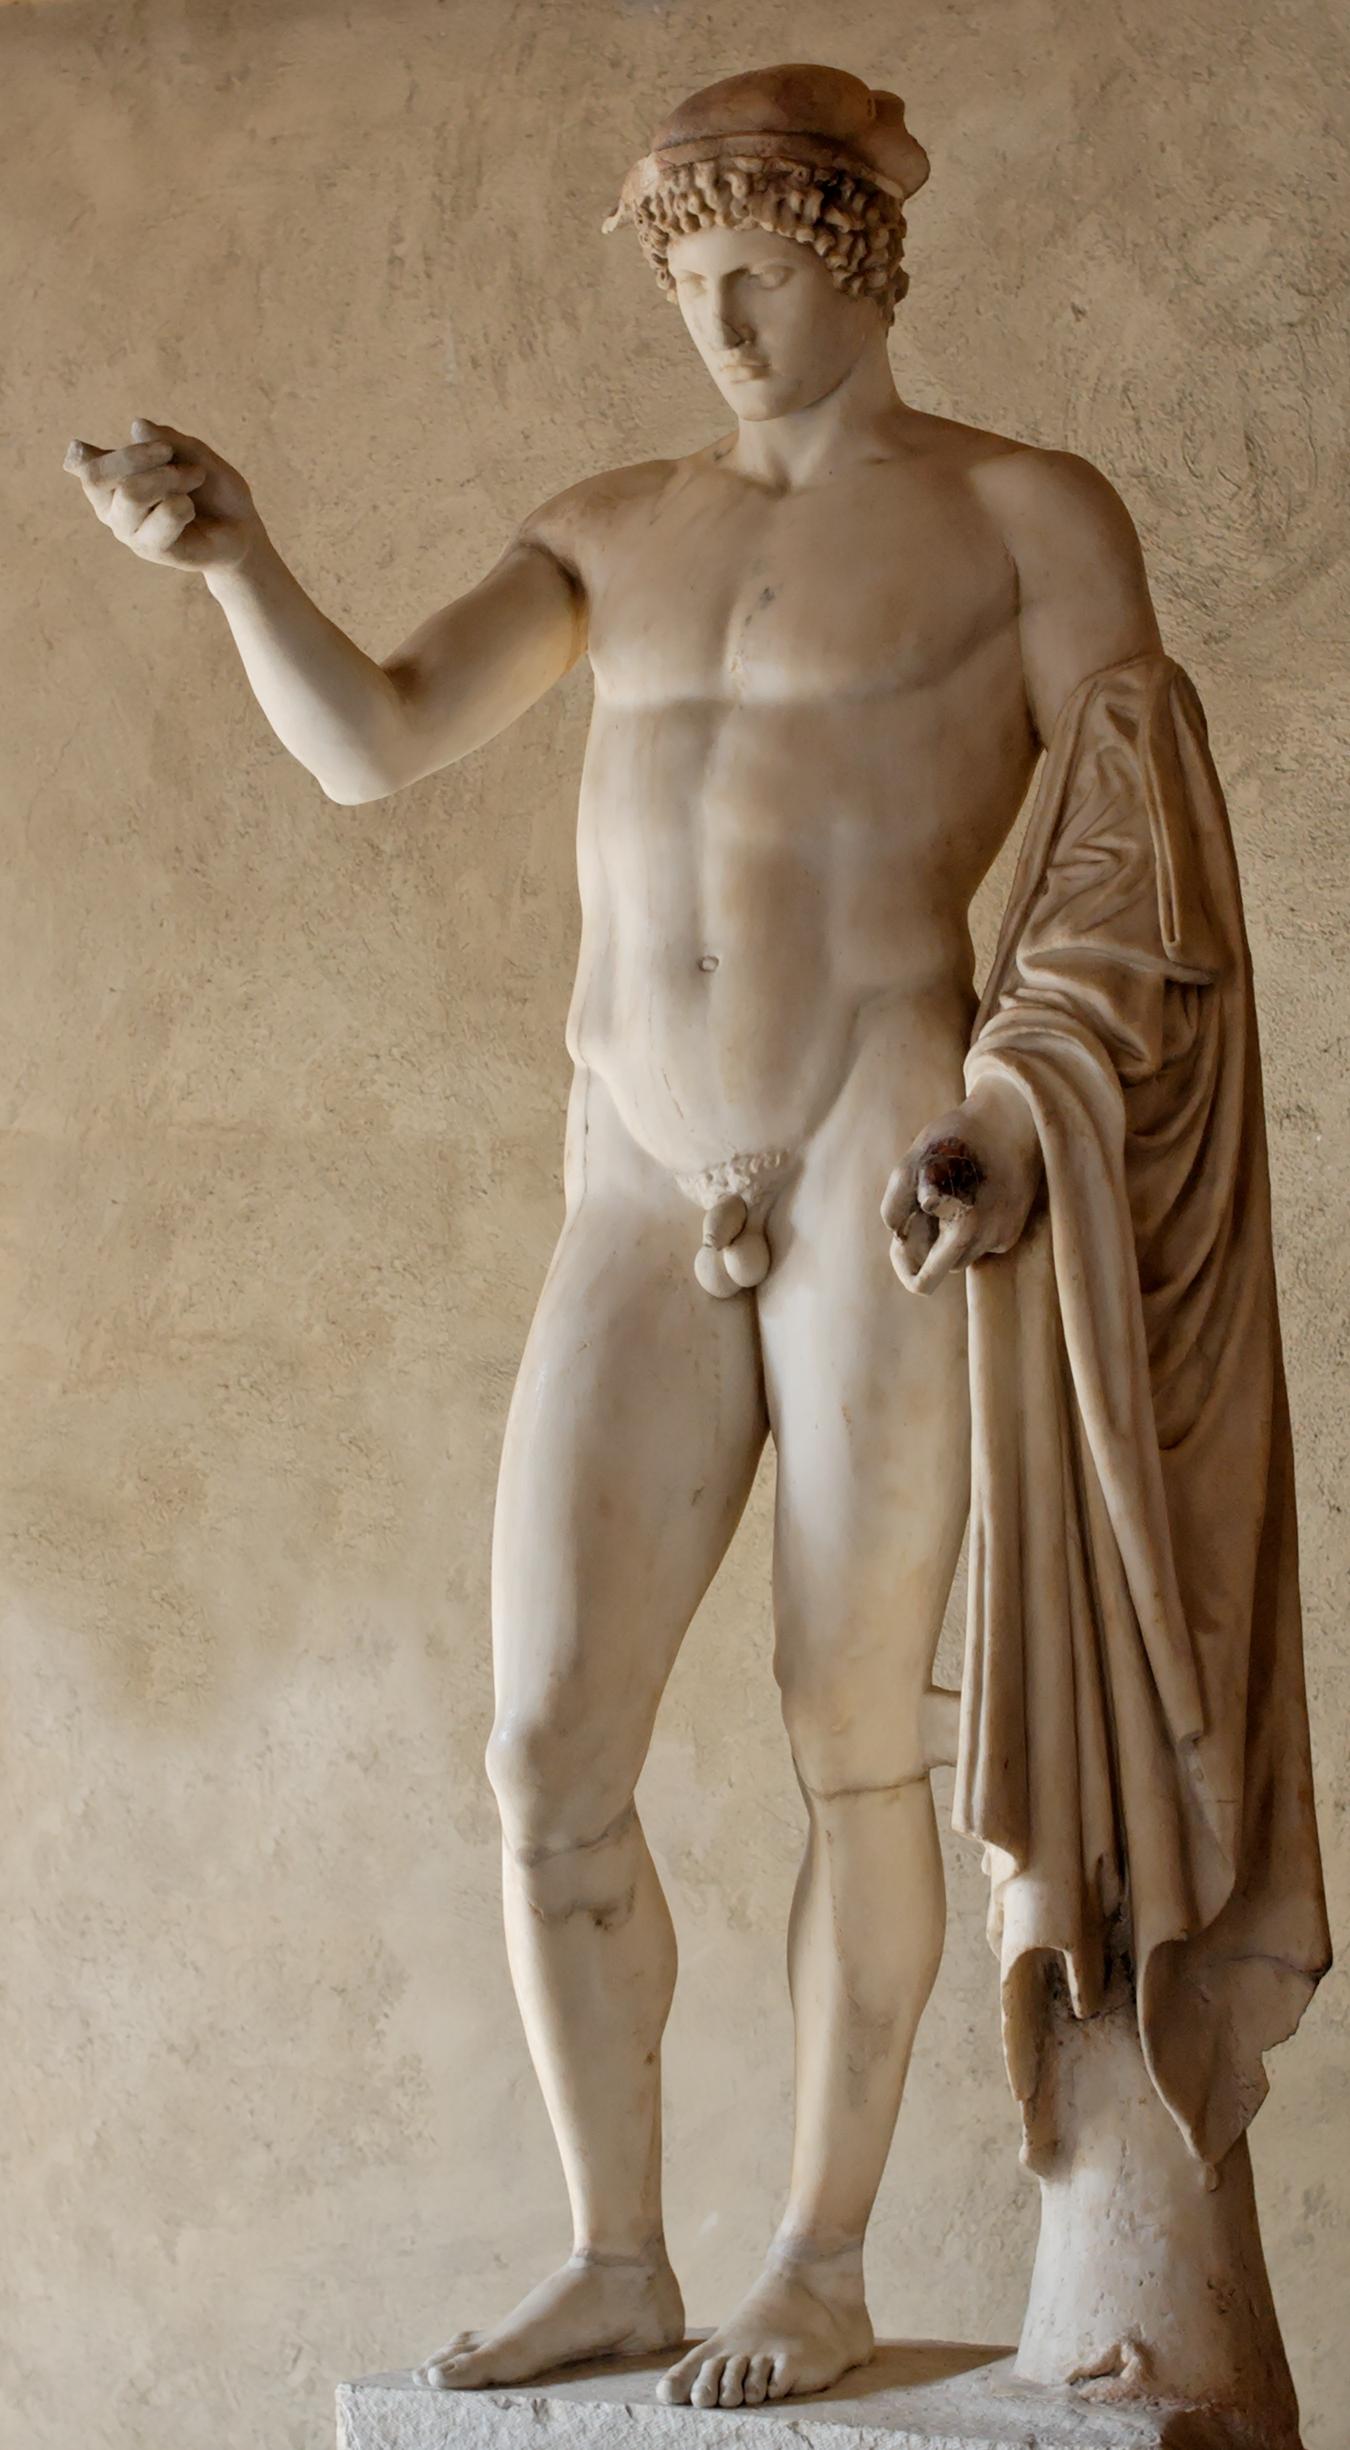 naked-greek-statue-guys